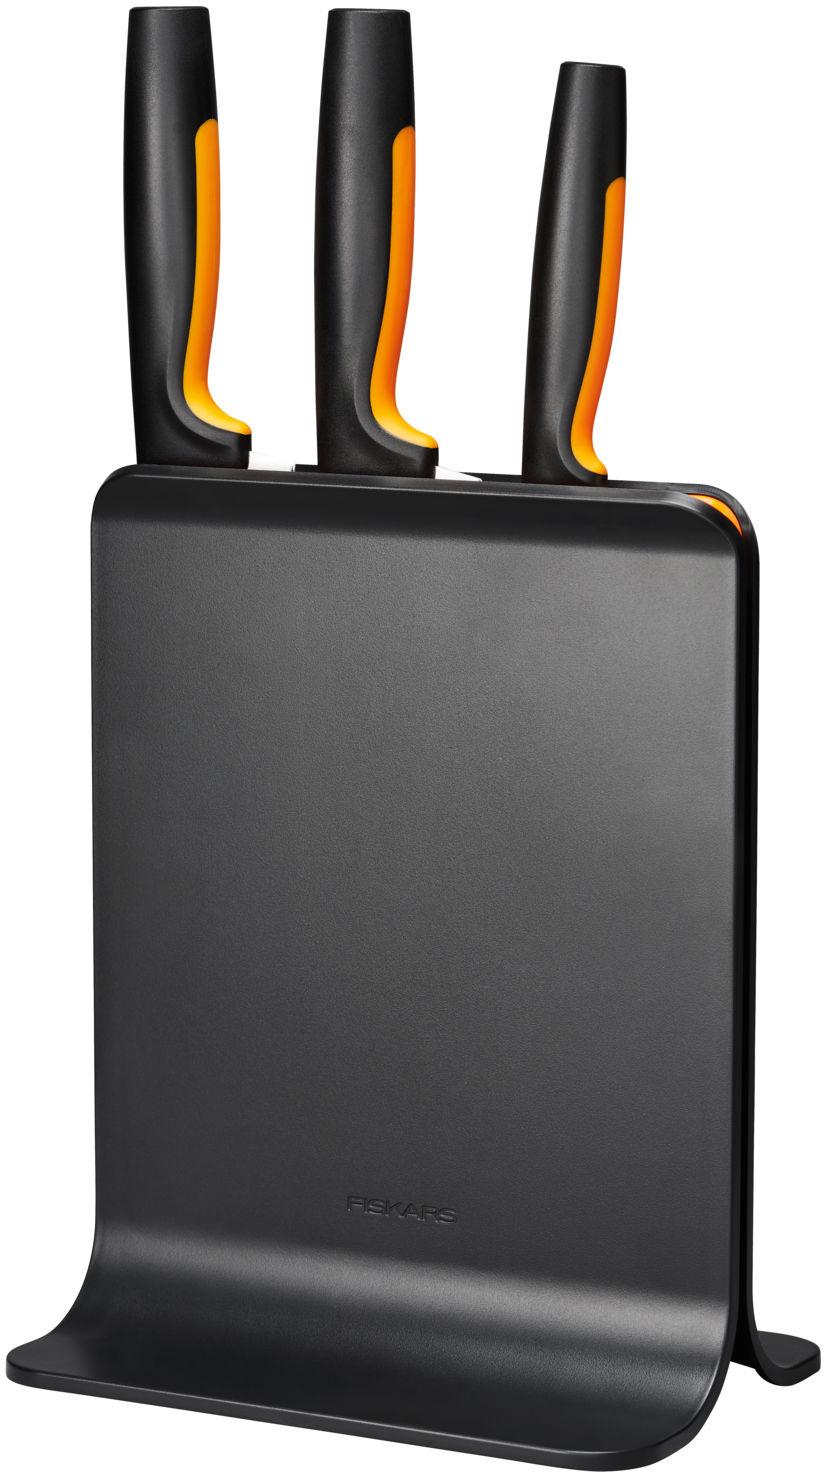 FISKARS Functional Form Zestaw 3 noży w bloku FISKARS 1057555